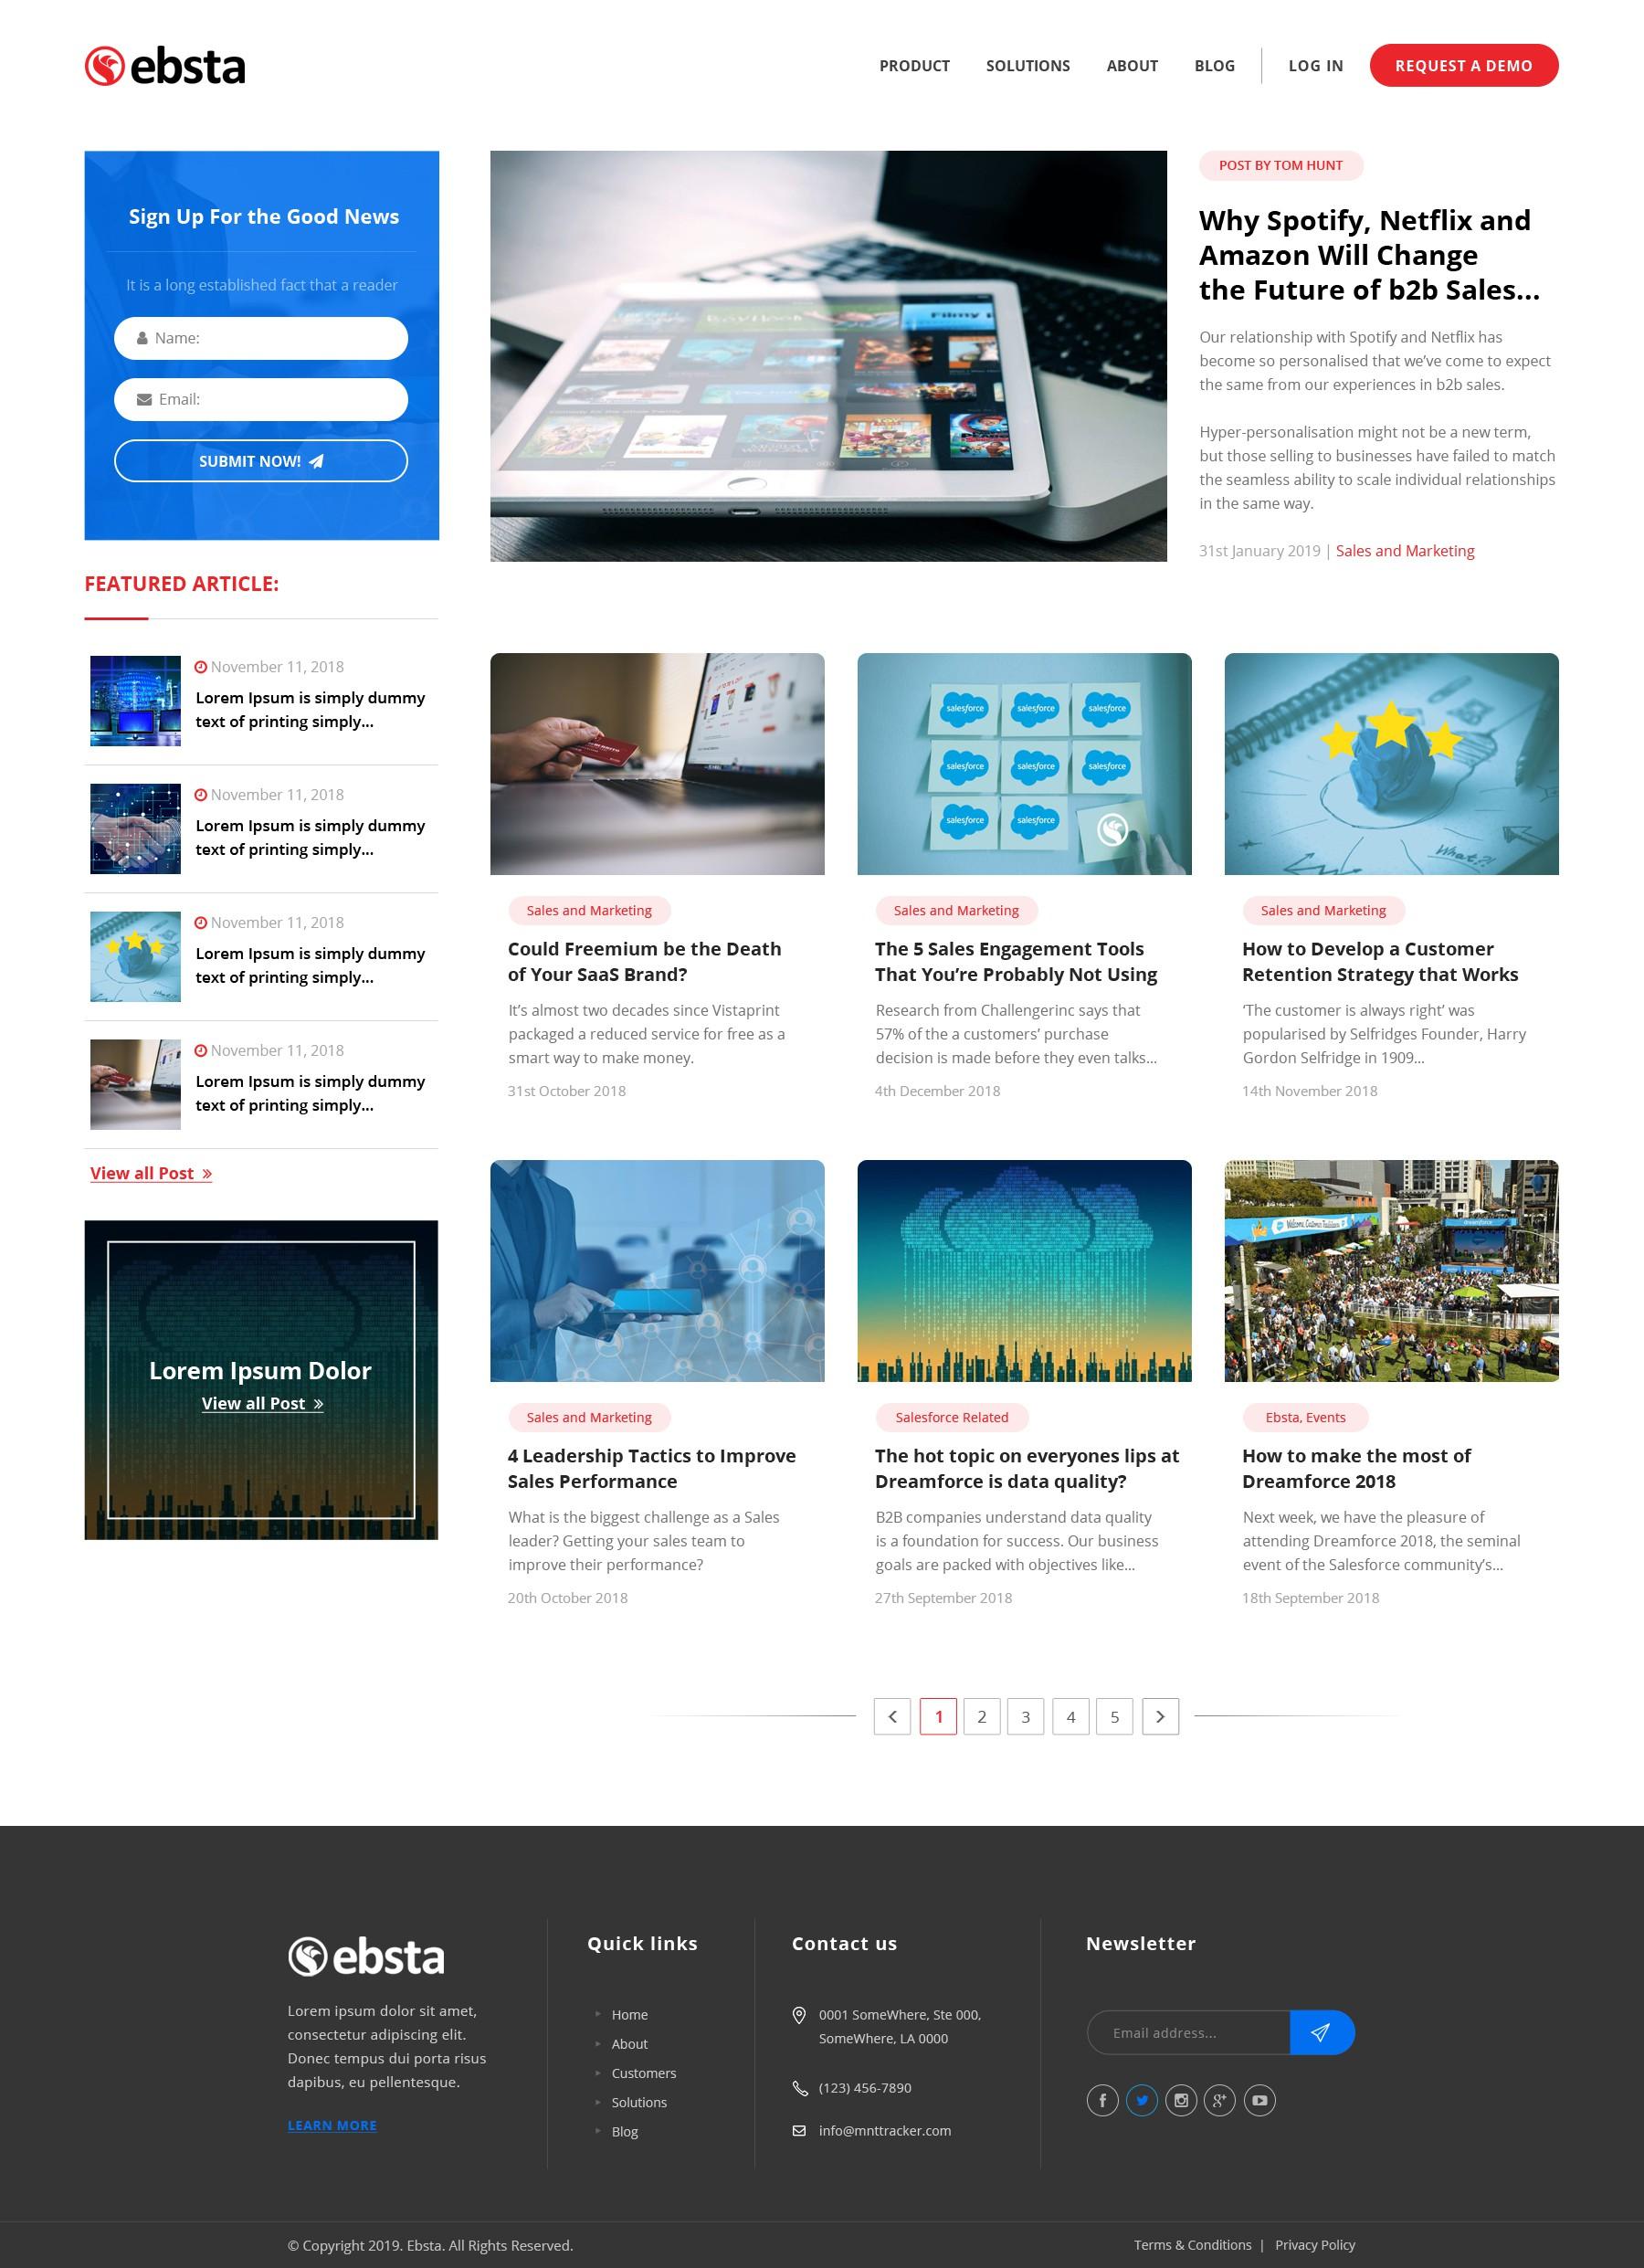 Website Redesign For B2B SAAS Biz Heading For Hypergrowth